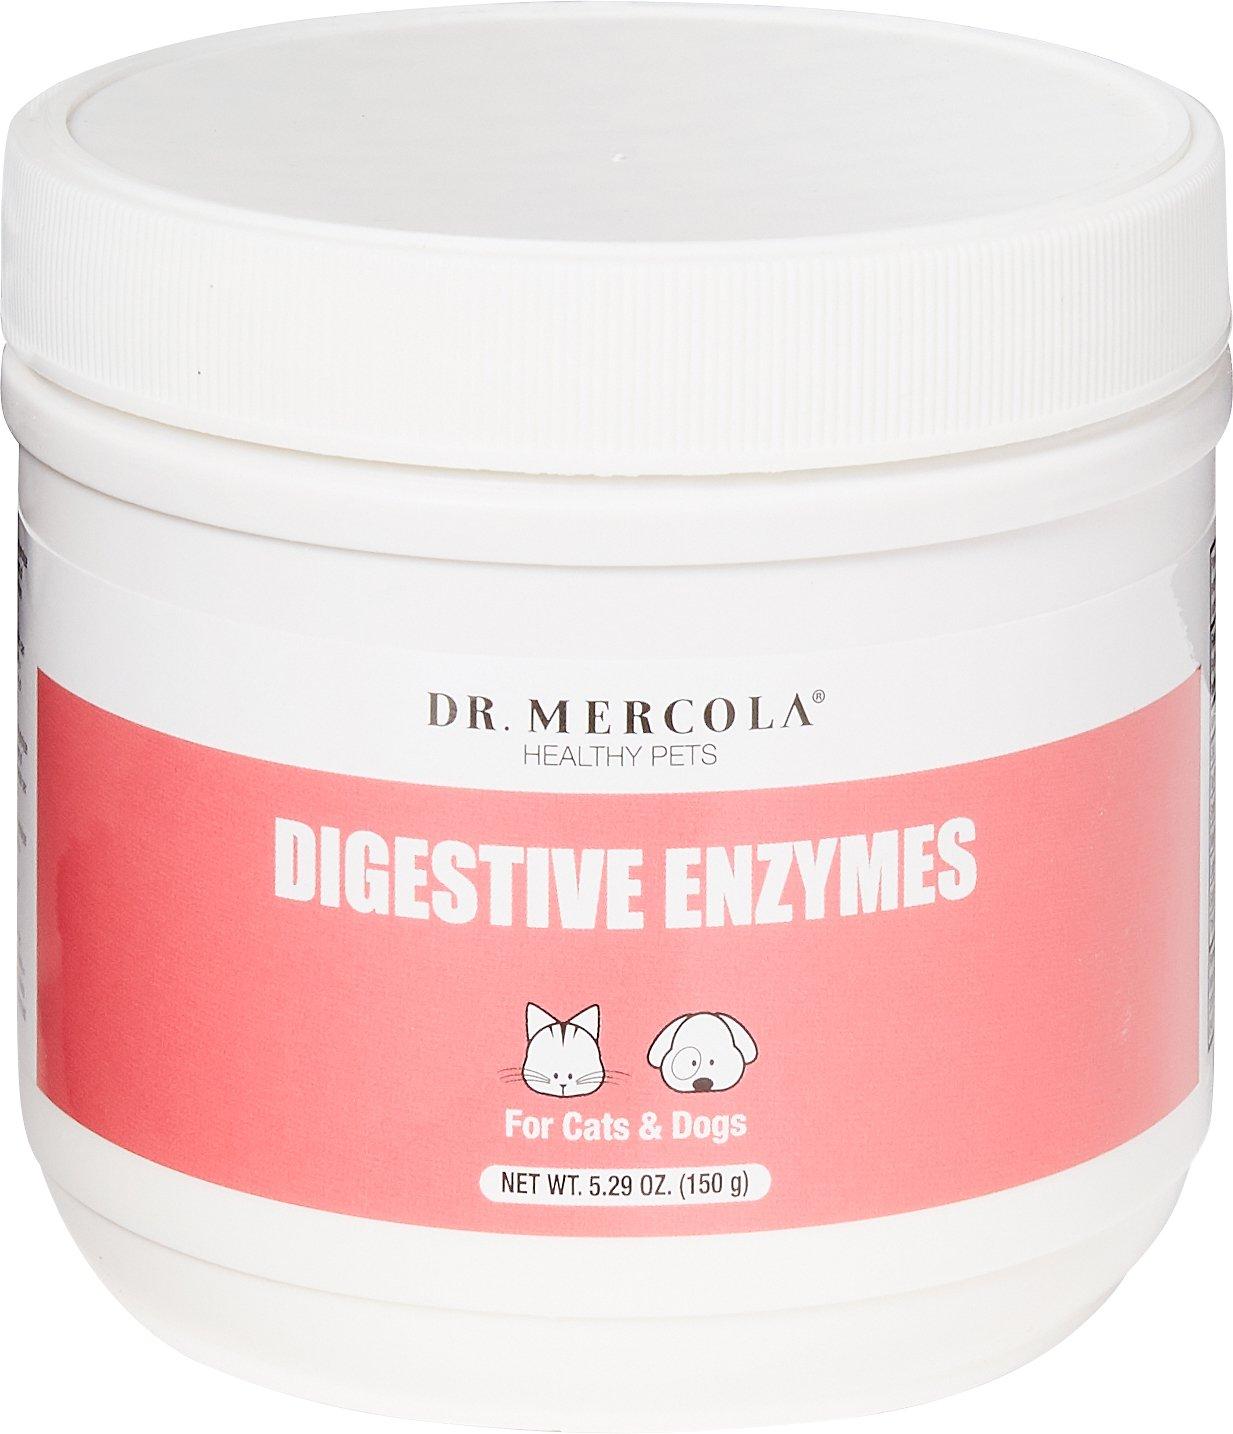 Dr. Mercola Digestive Enzymes Dog & Cat Supplement, 5.29-oz jar